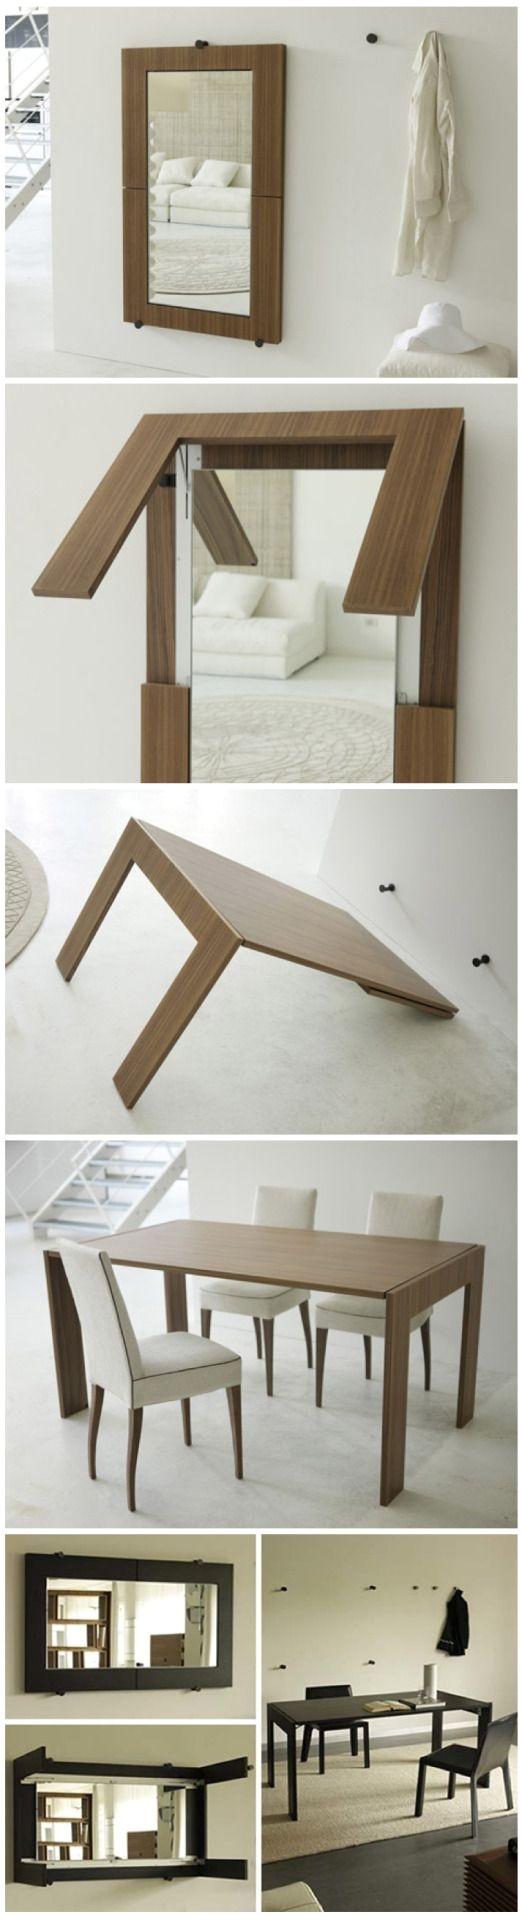 mirror table conversion muebles que se modificanque surtende la maleta maleta que